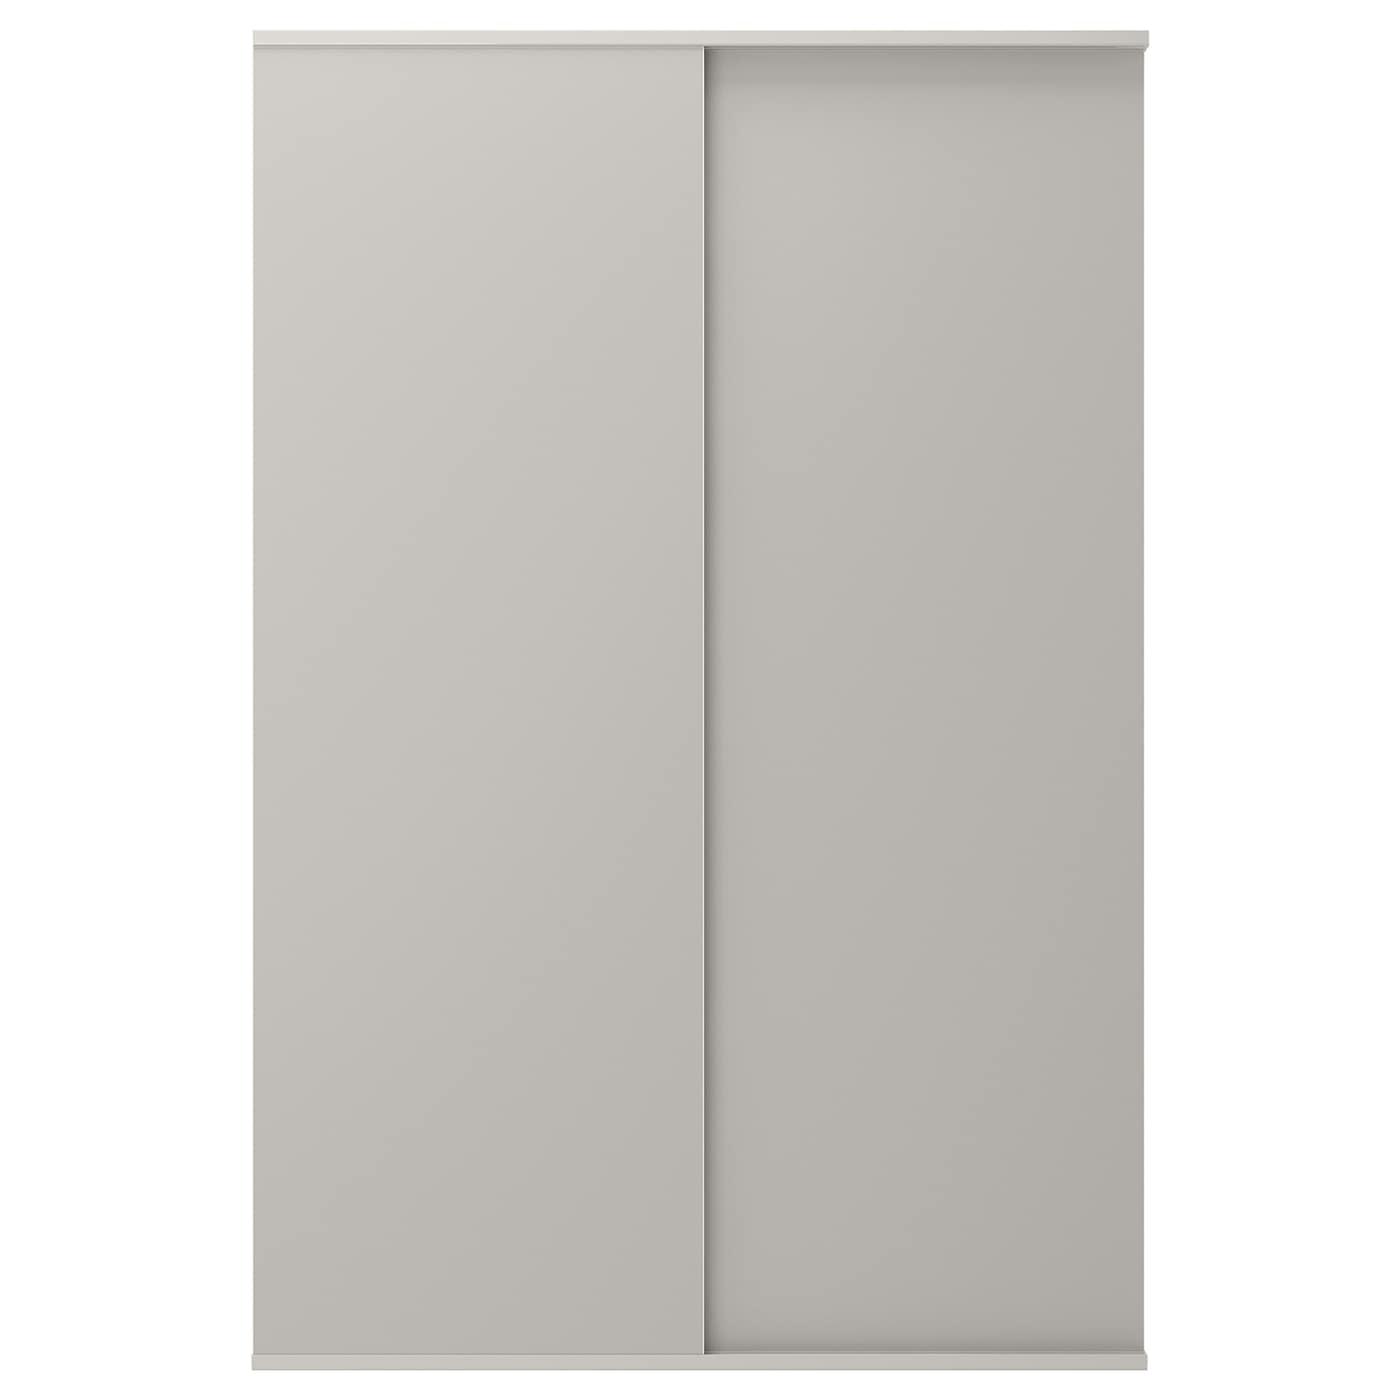 IKEA SKATVAL Porte Coulissante Avec Rail